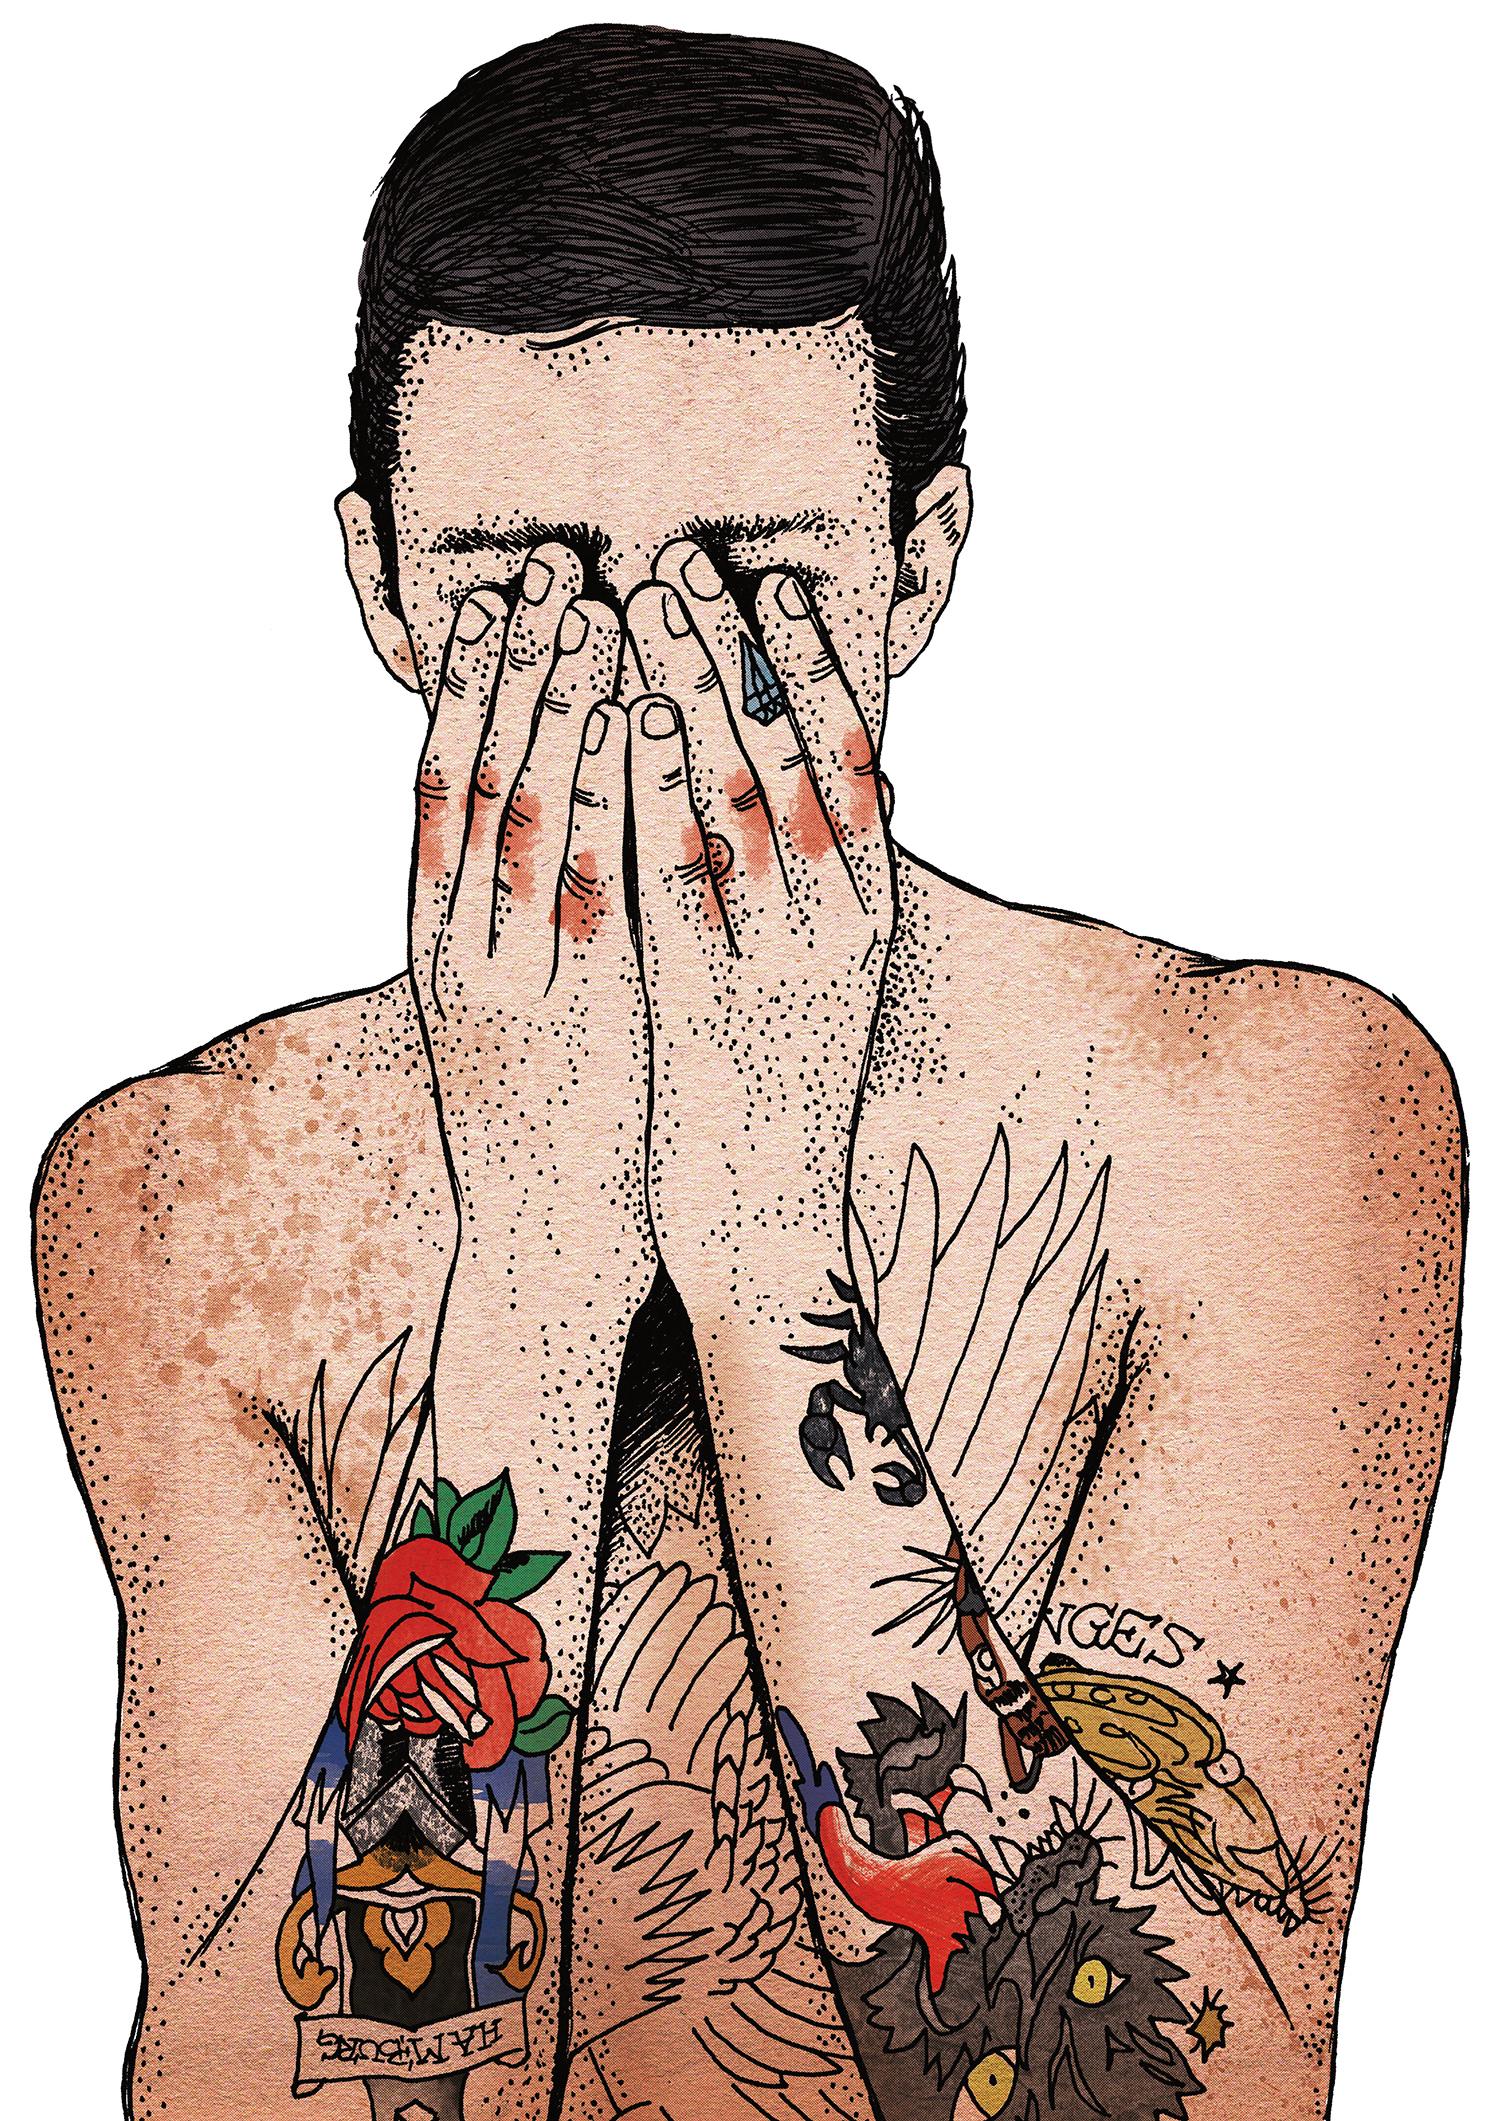 rbtq_Illustration_Seiser_Illustratorin_Hamburg_Tattoo_Prinz_dots.jpg